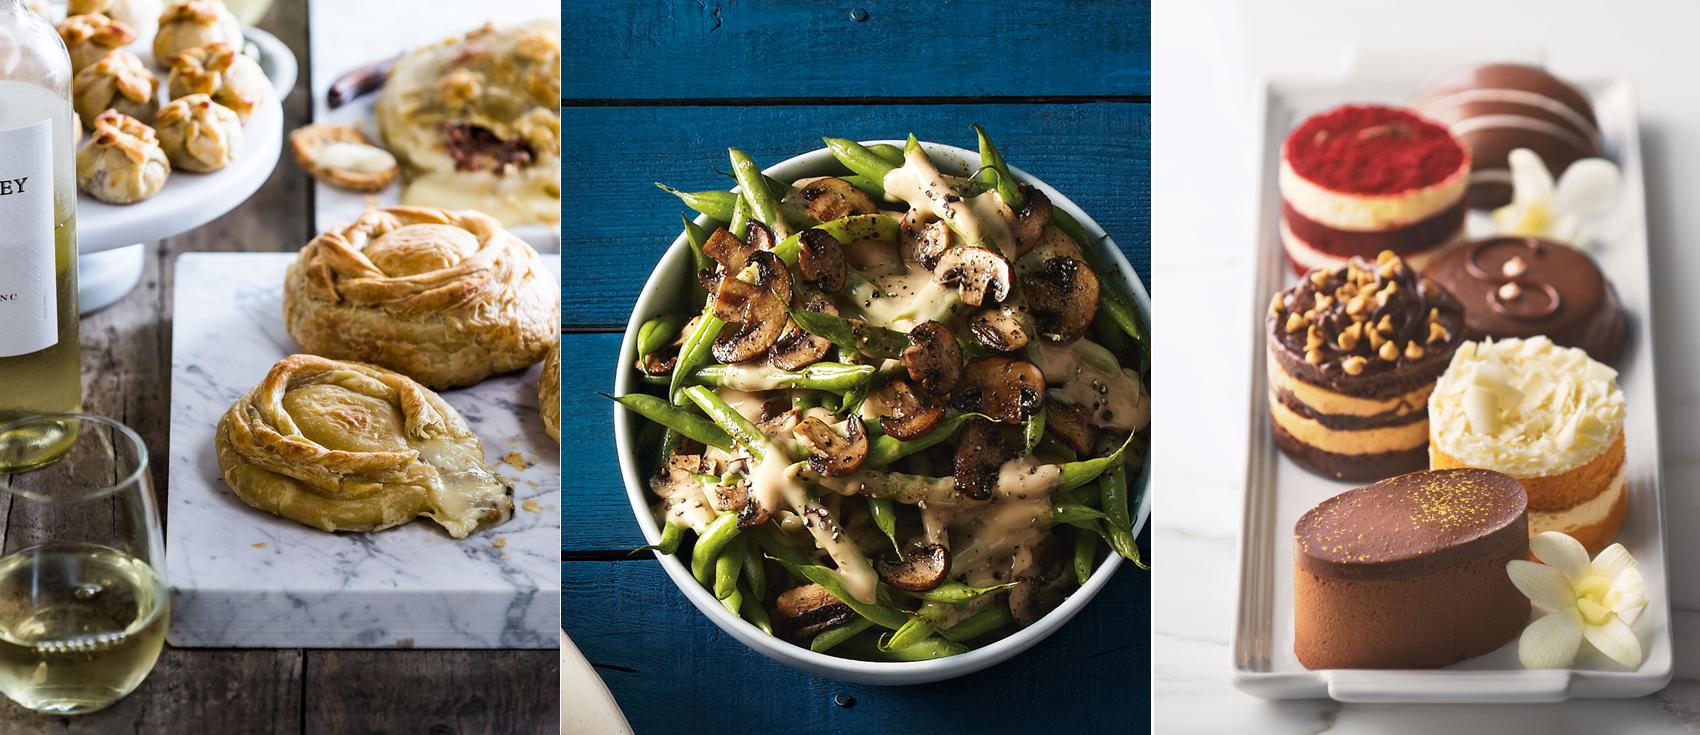 Gourmet Food Online